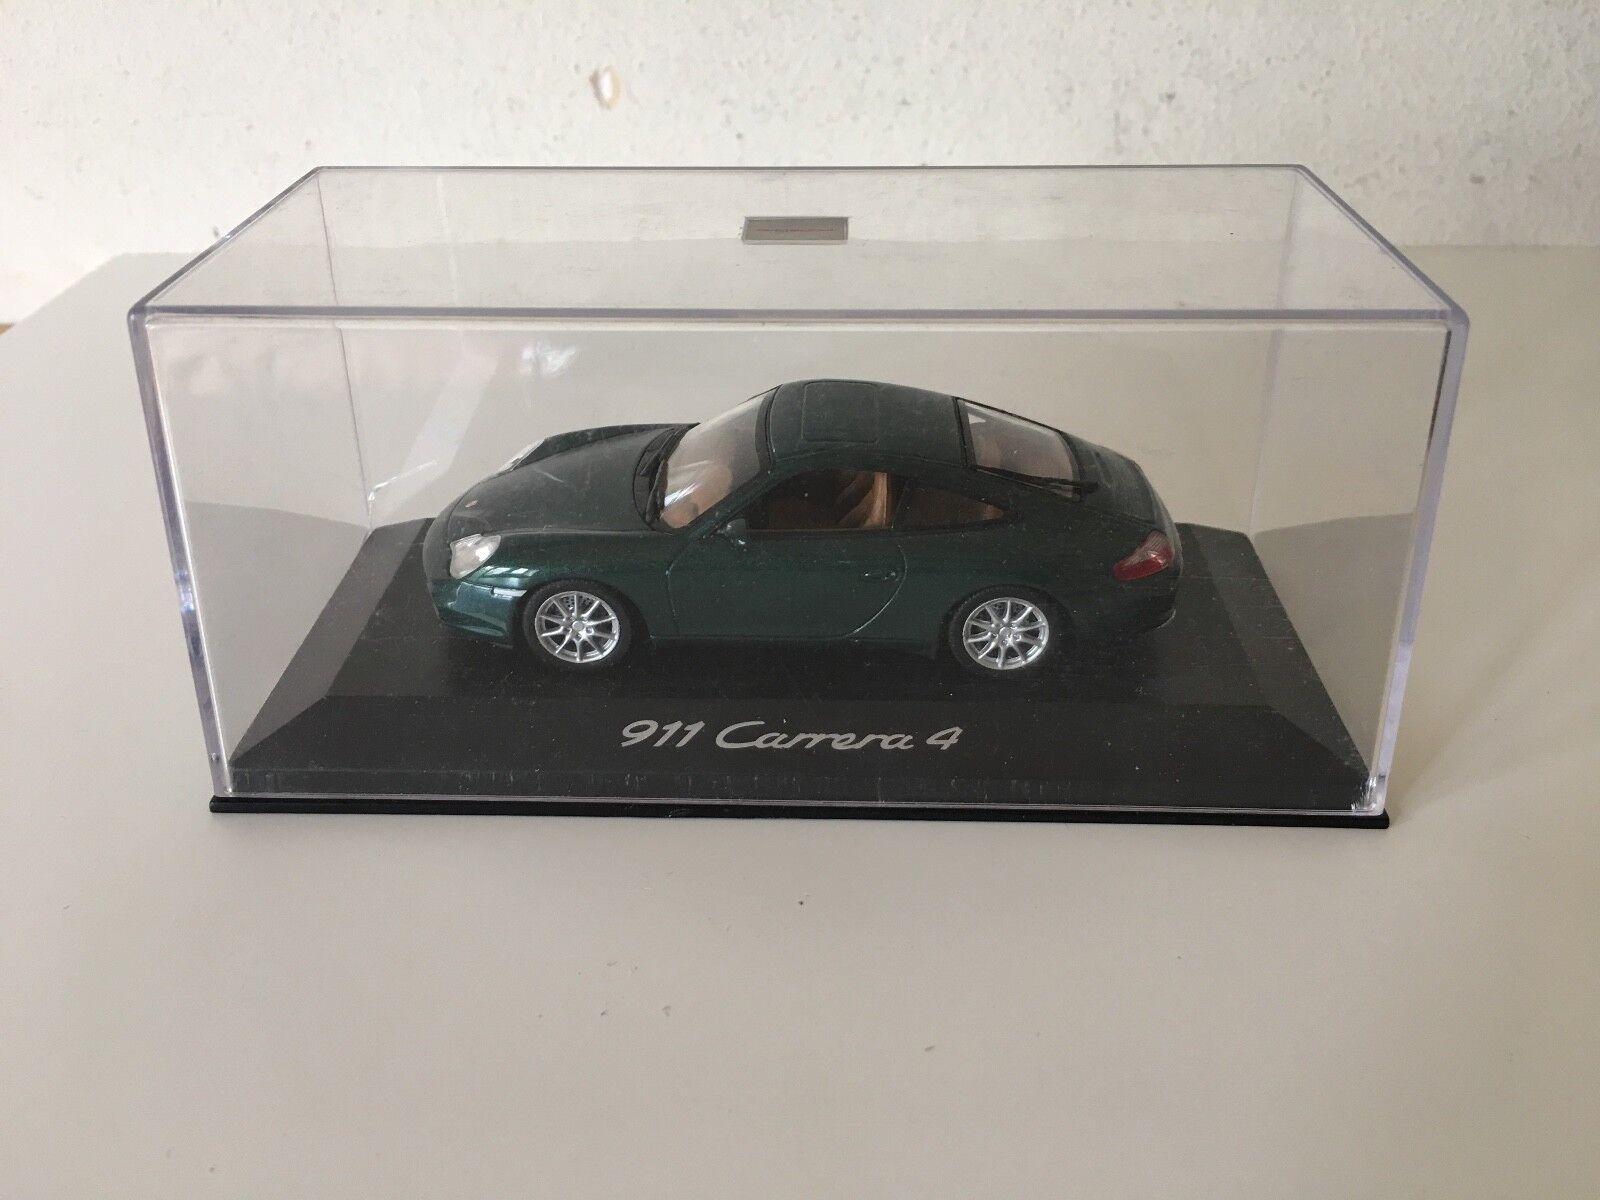 Used Like Neu - Car Miniature Porsche 911 Carrera 4 Auto Miniatur - Gebraucht